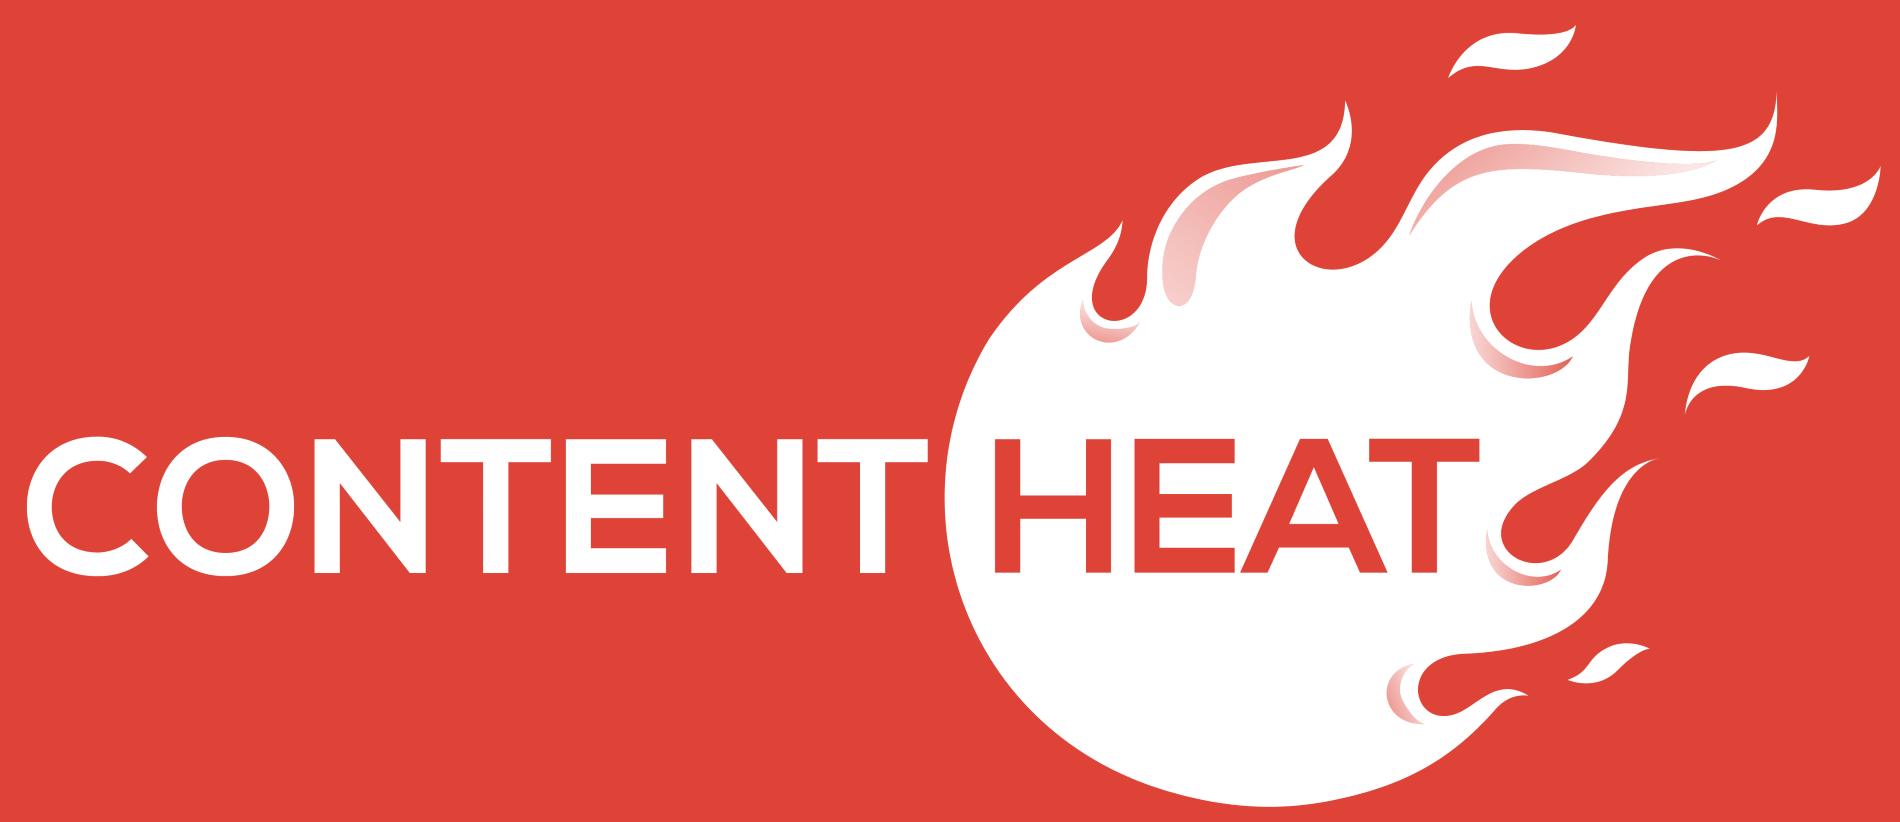 Best Linkedin Profile Writing Service - ContentHeat